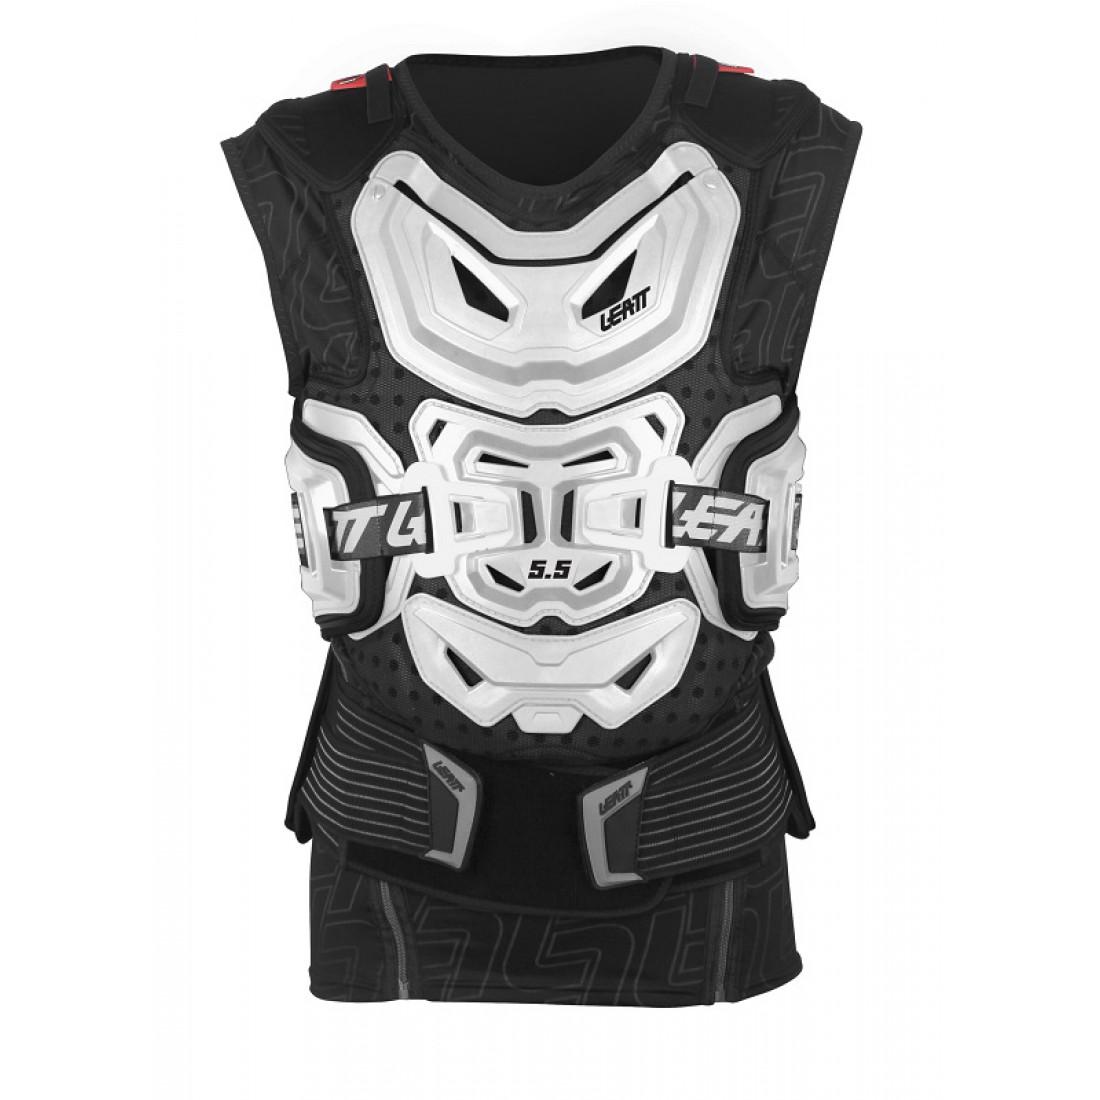 Leatt - 2017 Body Vest 5.5 защитный жилет, белый